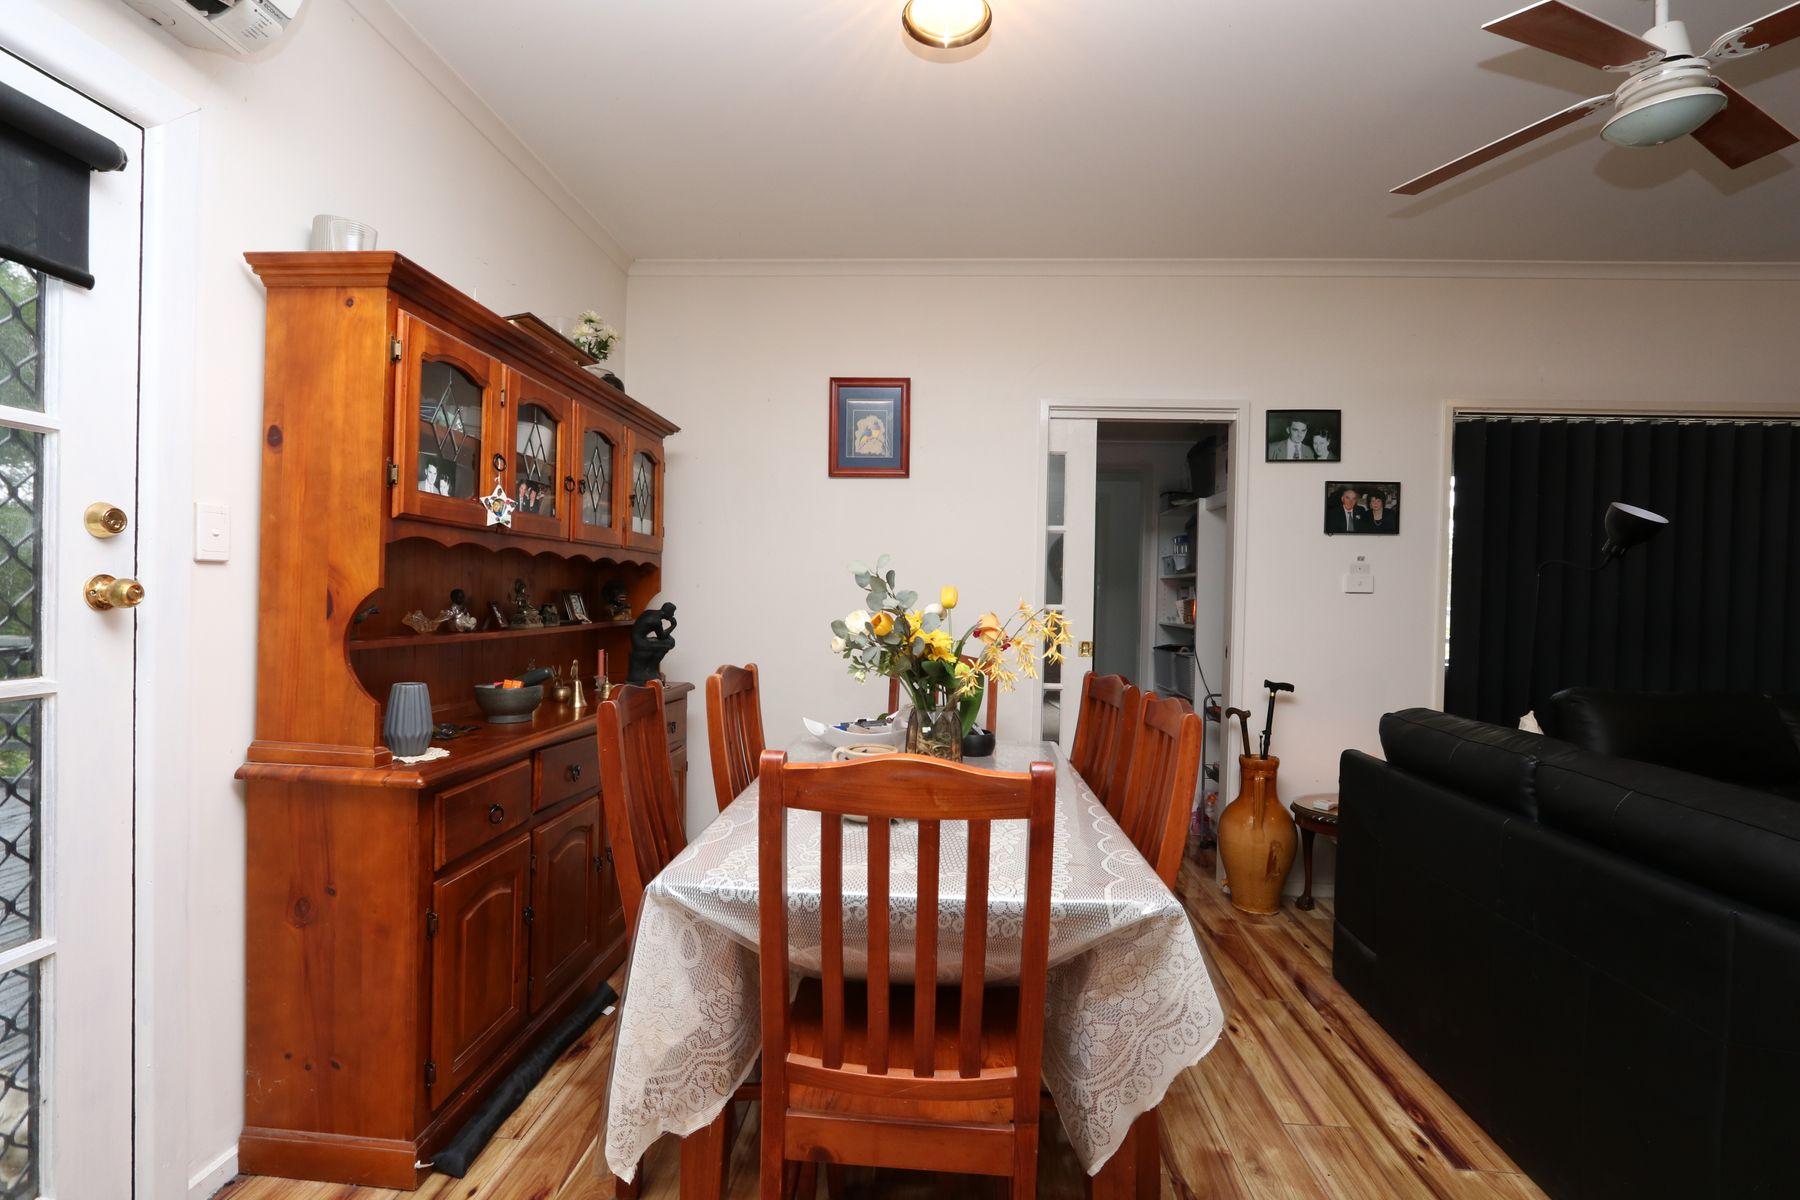 108 Wheens Road, MAJORCA, Maryborough, VIC 3465